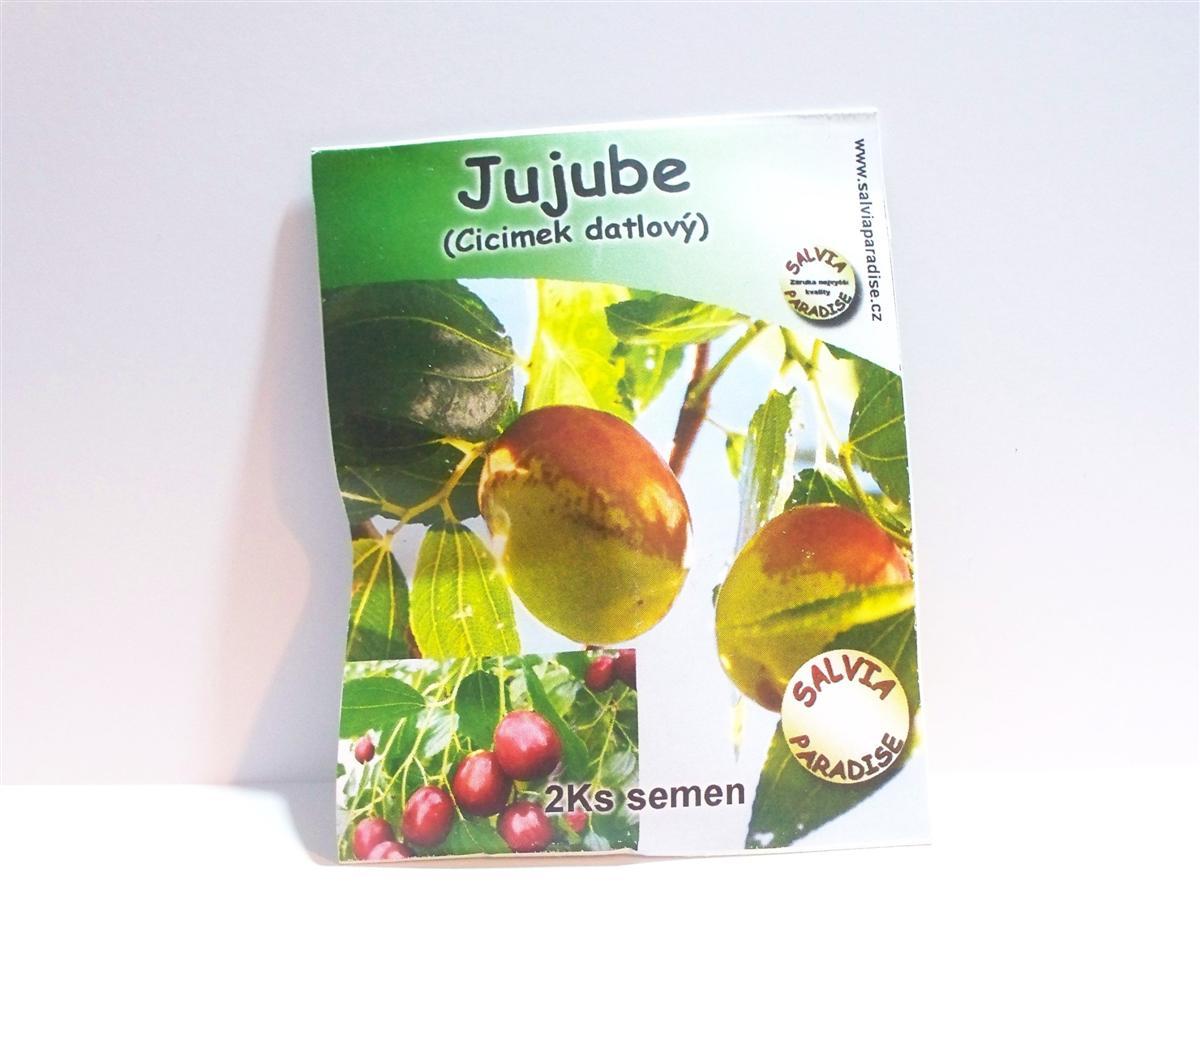 Salvia Paradise JUJUBE - Cicimek datlový semena 2 Ks